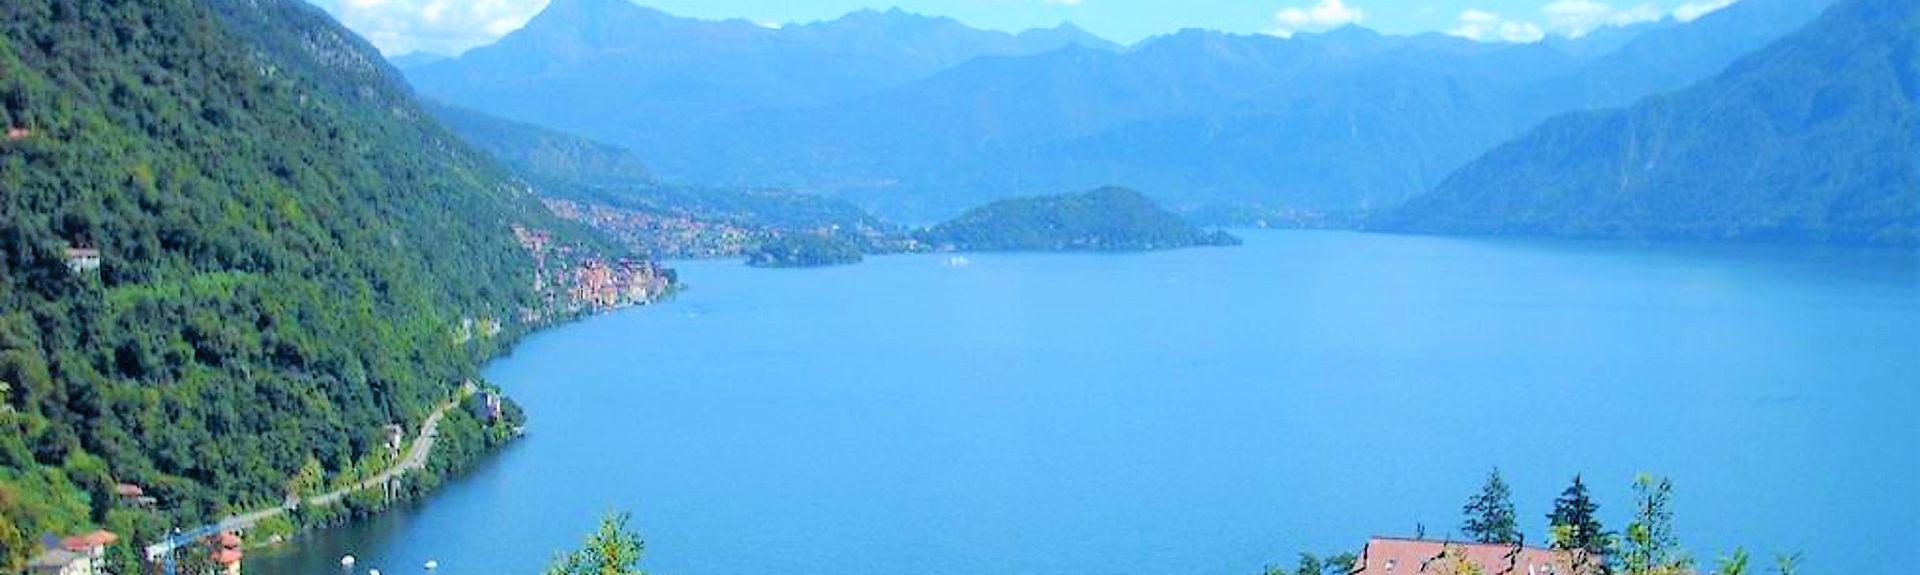 Tremezzo, Como, Lombardy, Italy